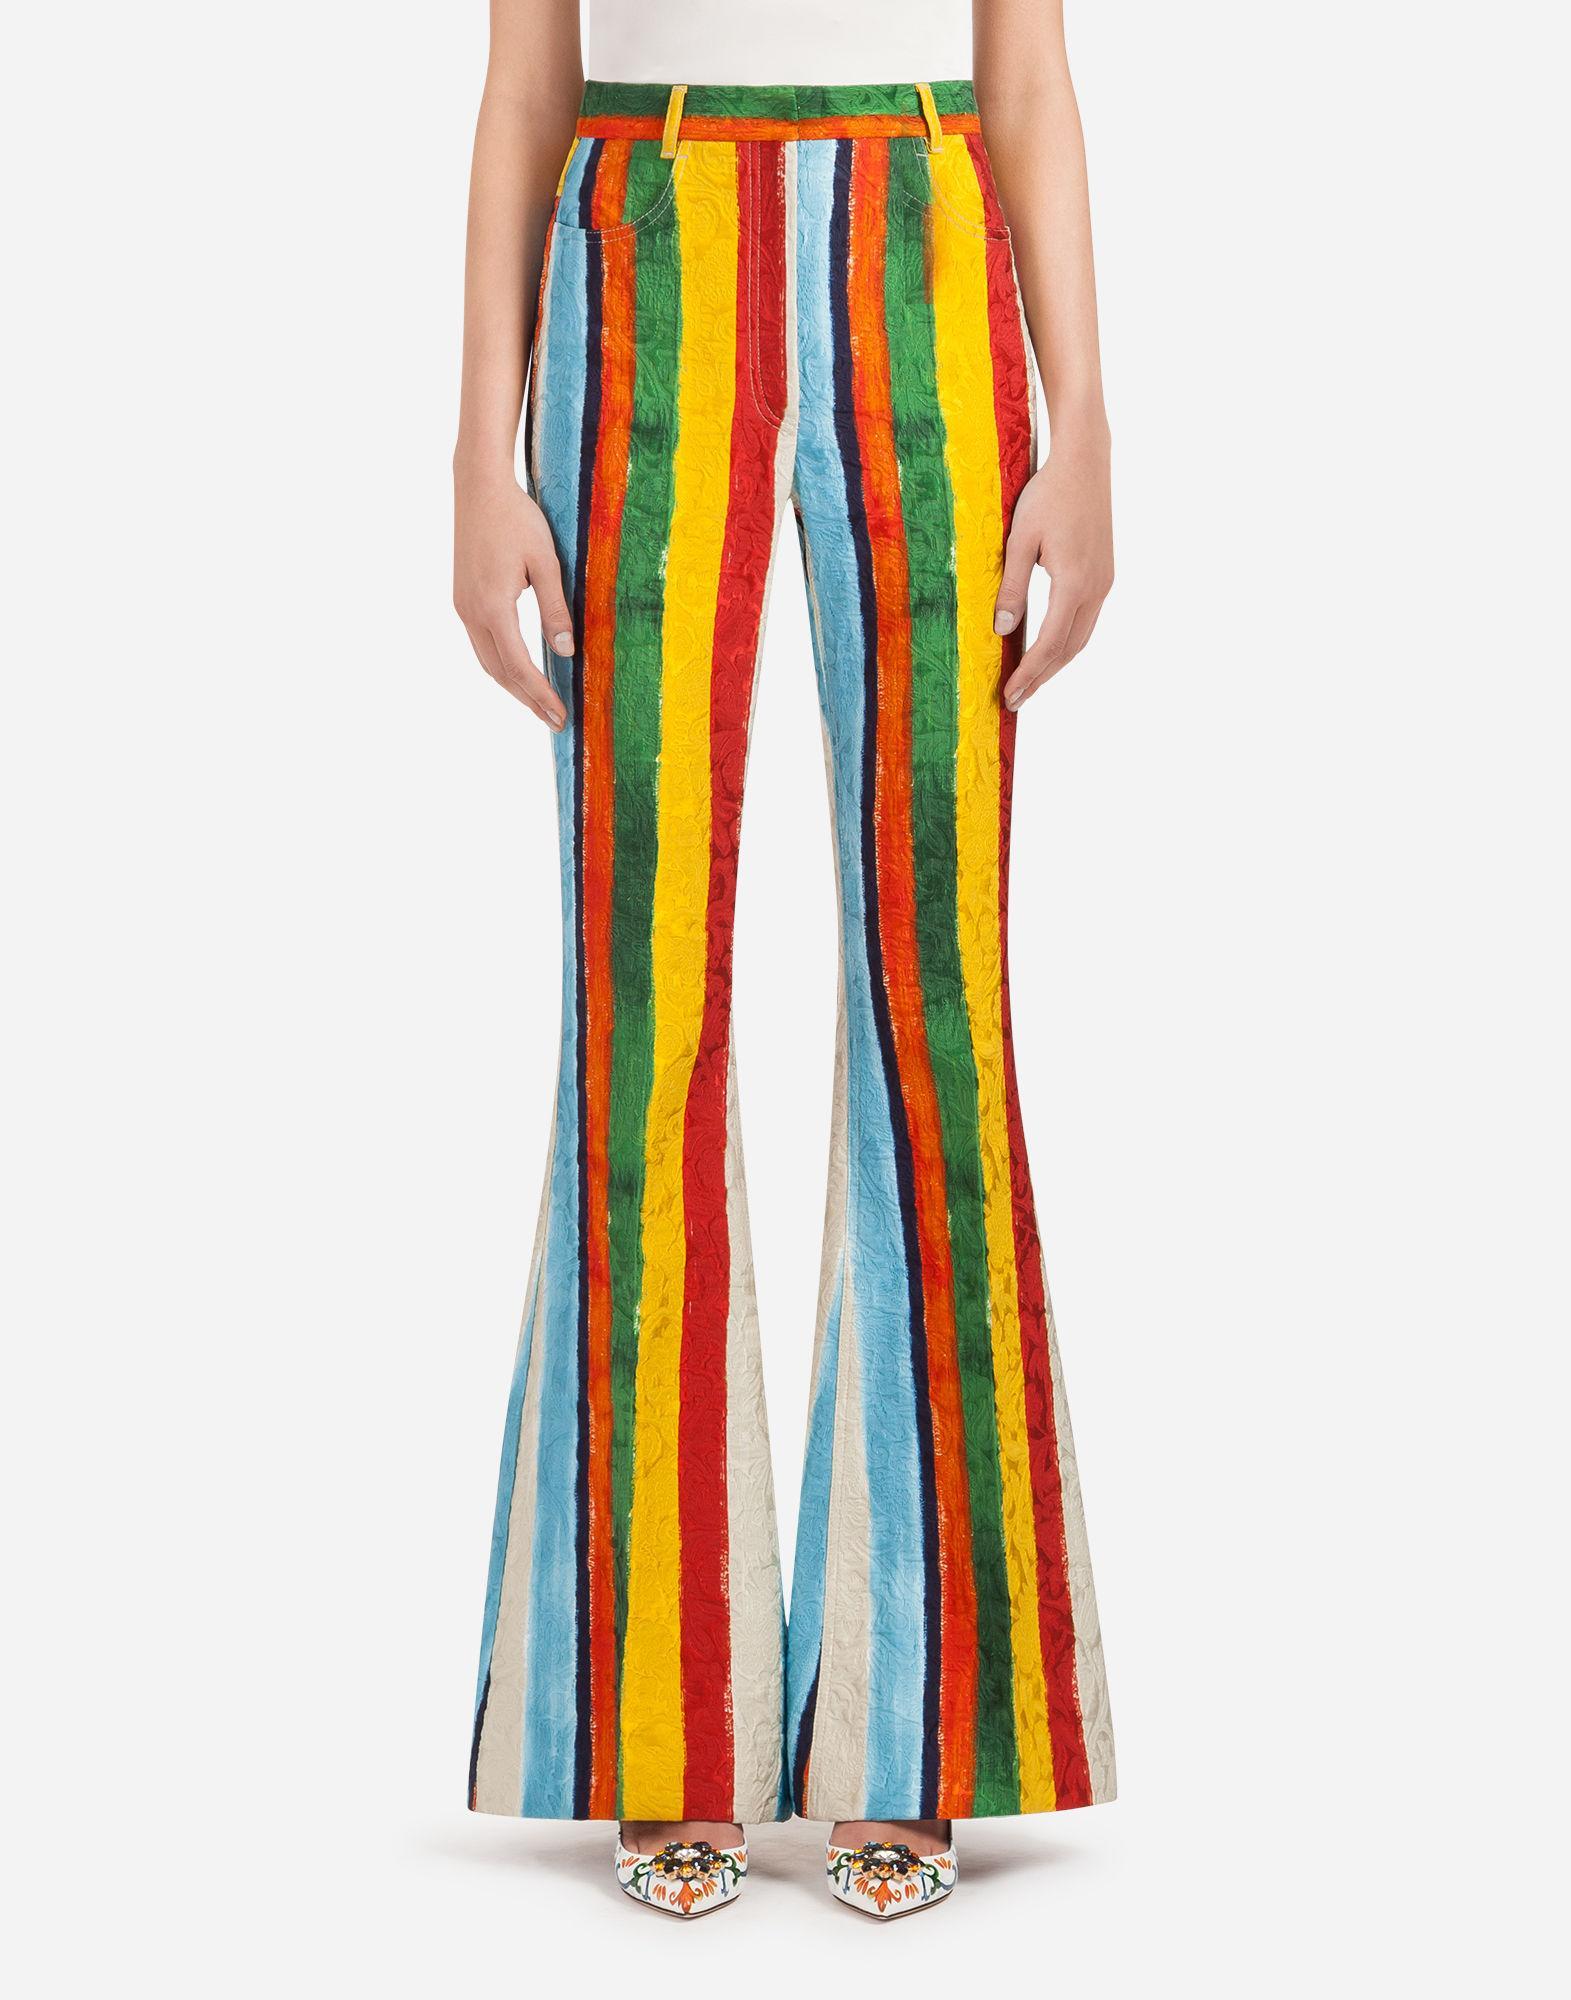 Dolce & Gabbana Printed Brocade Pants In Yellow